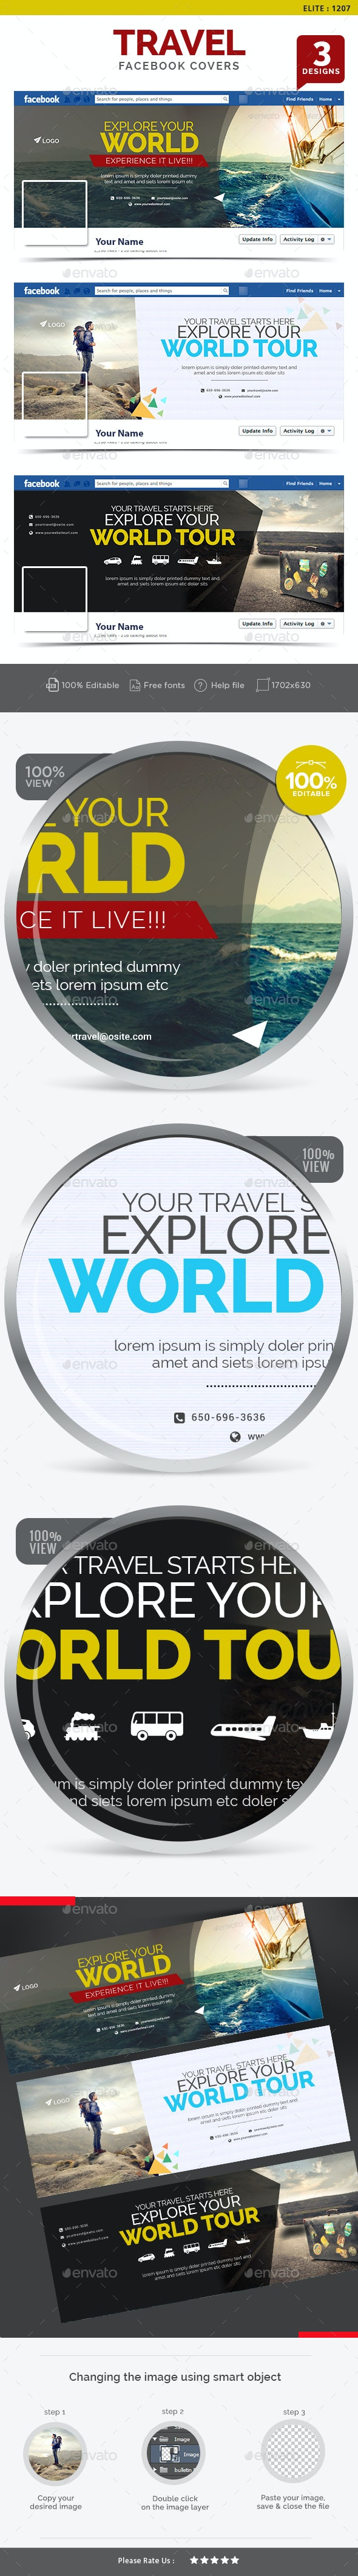 Travel Facebook Covers - 3 Designs - Facebook Timeline Covers Social Media